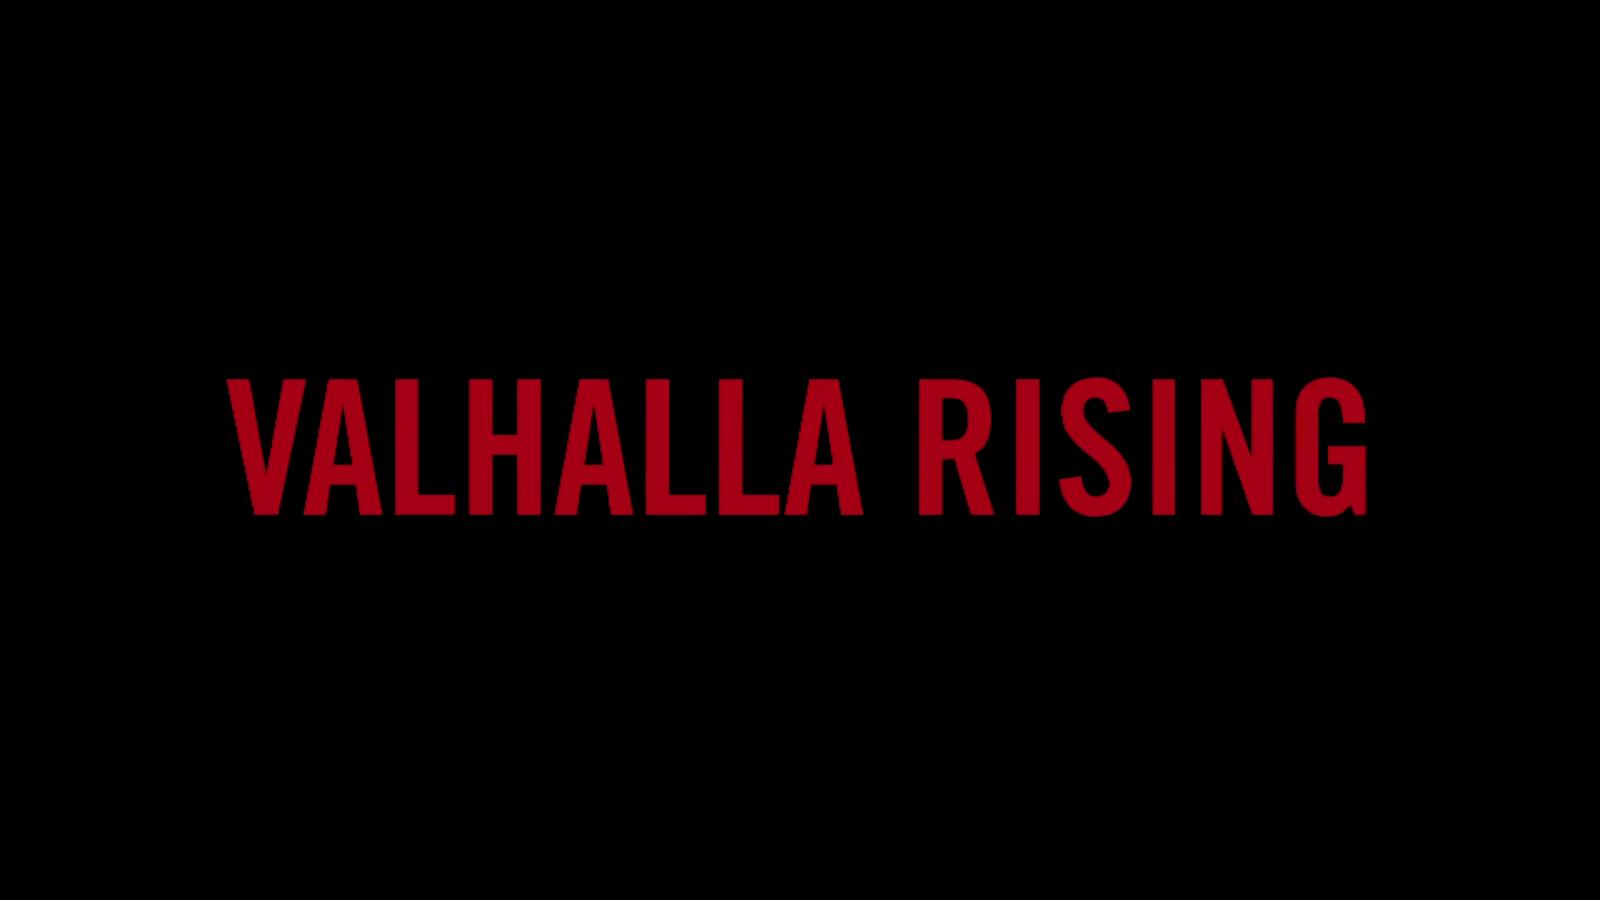 Shift Command Three Valhalla Rising Nicolas Winding Refn